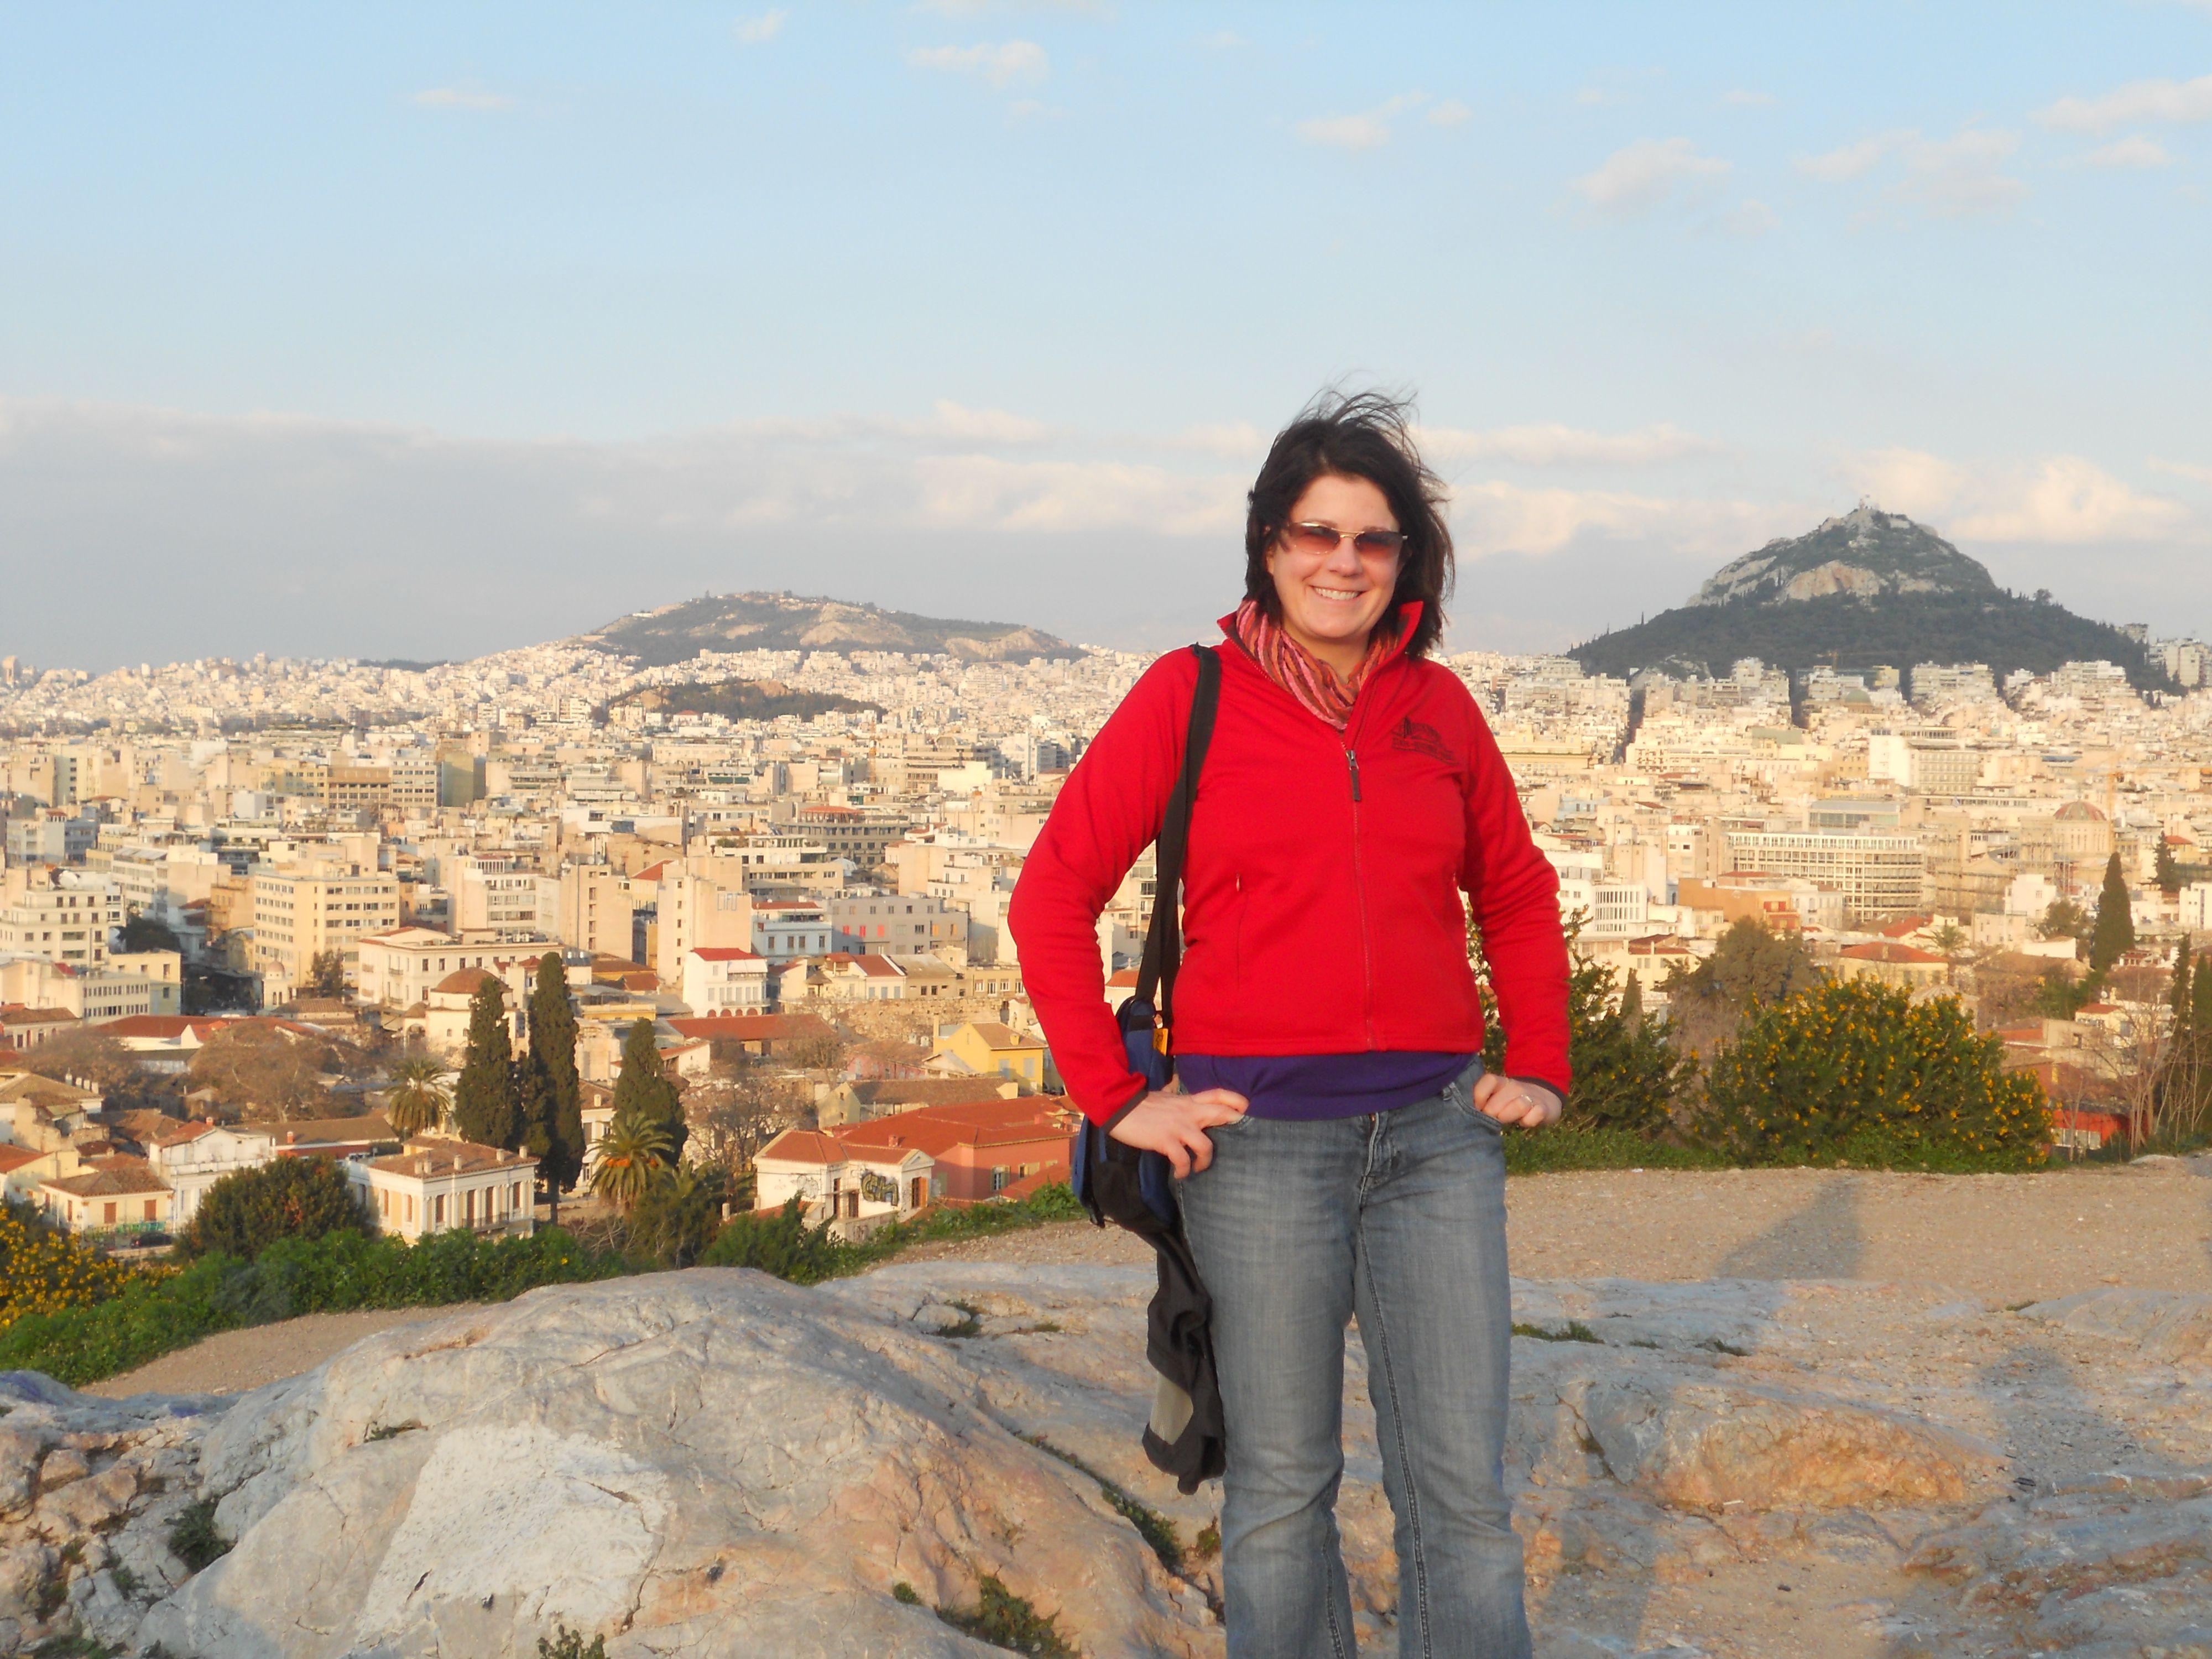 Mars Hill, Athens, Greece.